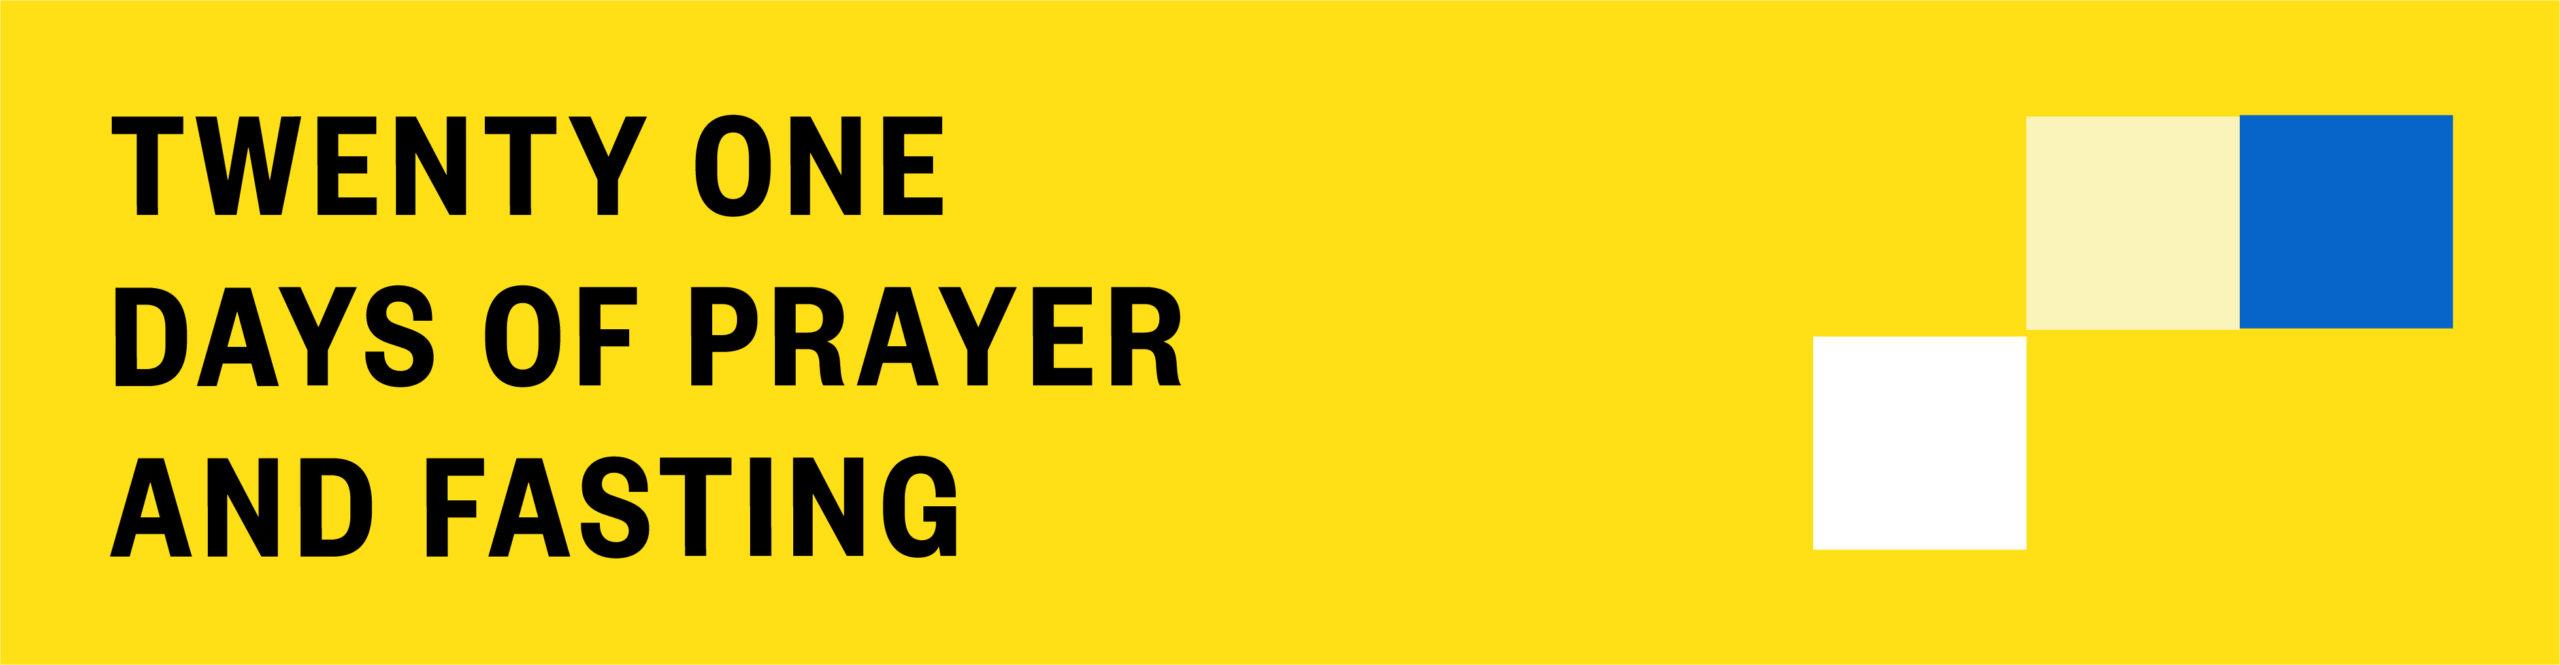 2021_21 Days of Prayer_Digital_940x244_